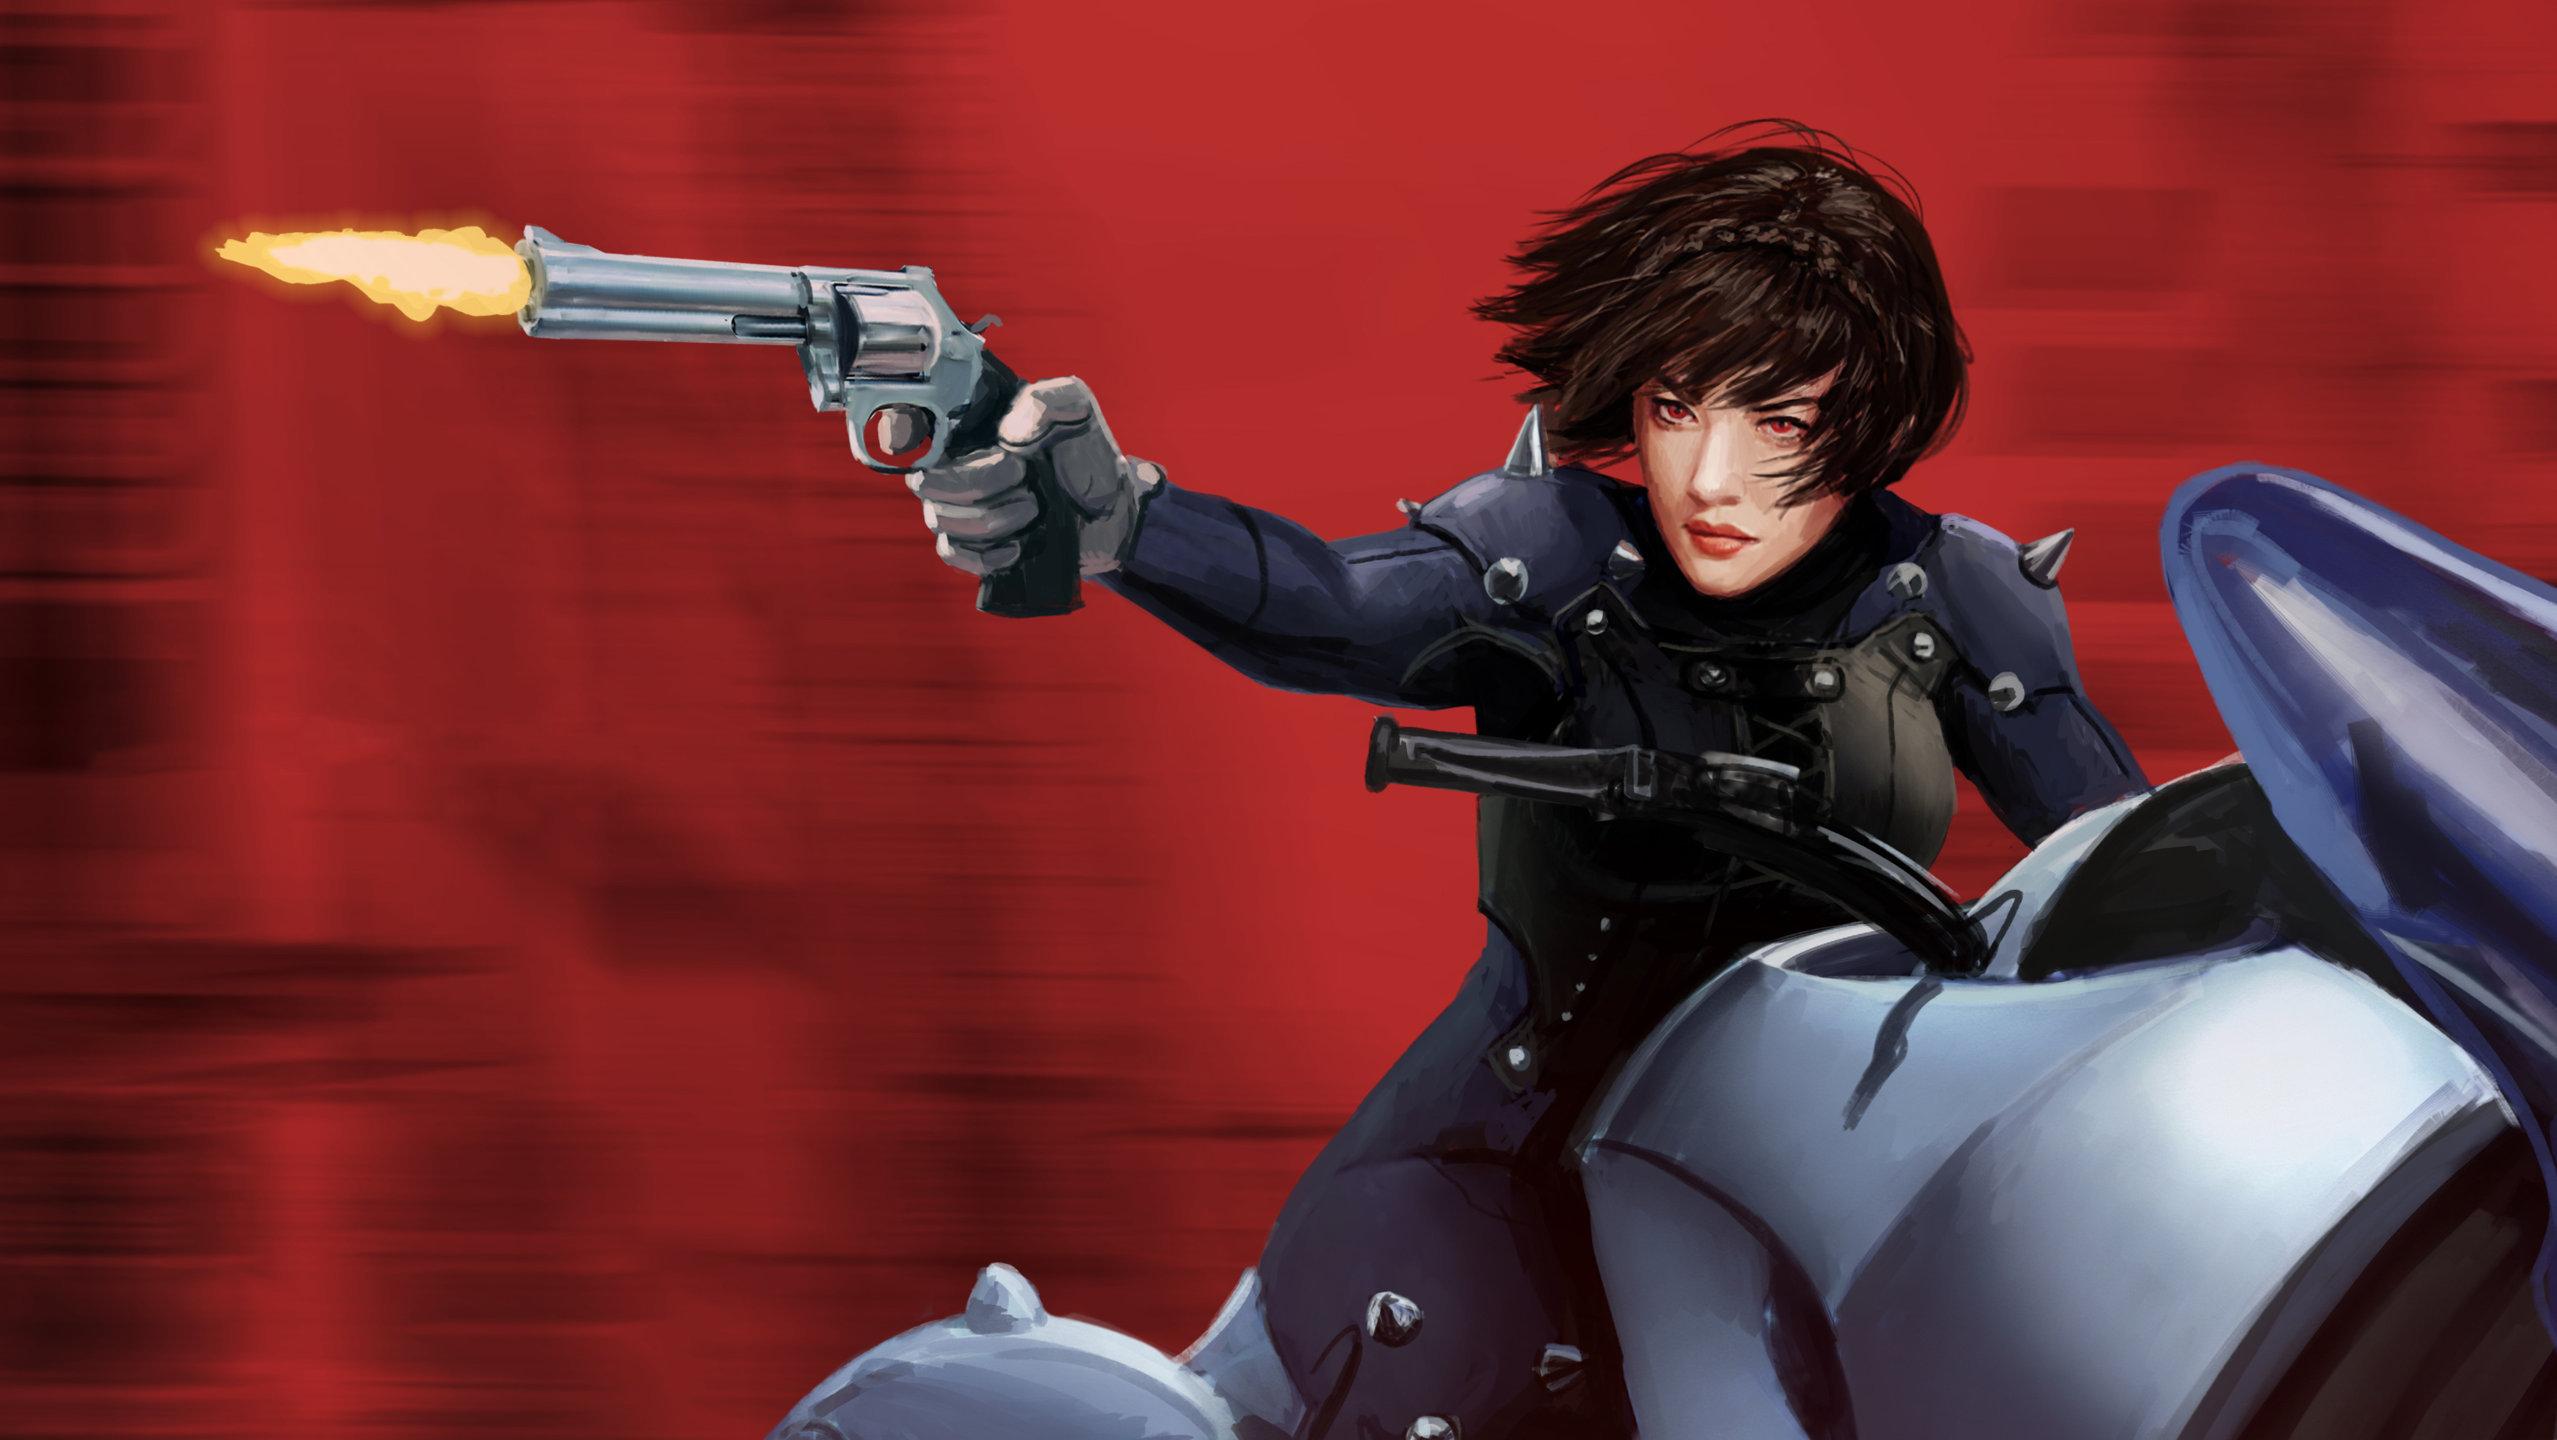 Ultra HD Protagonist Kun Persona 5 Wallpaper Games